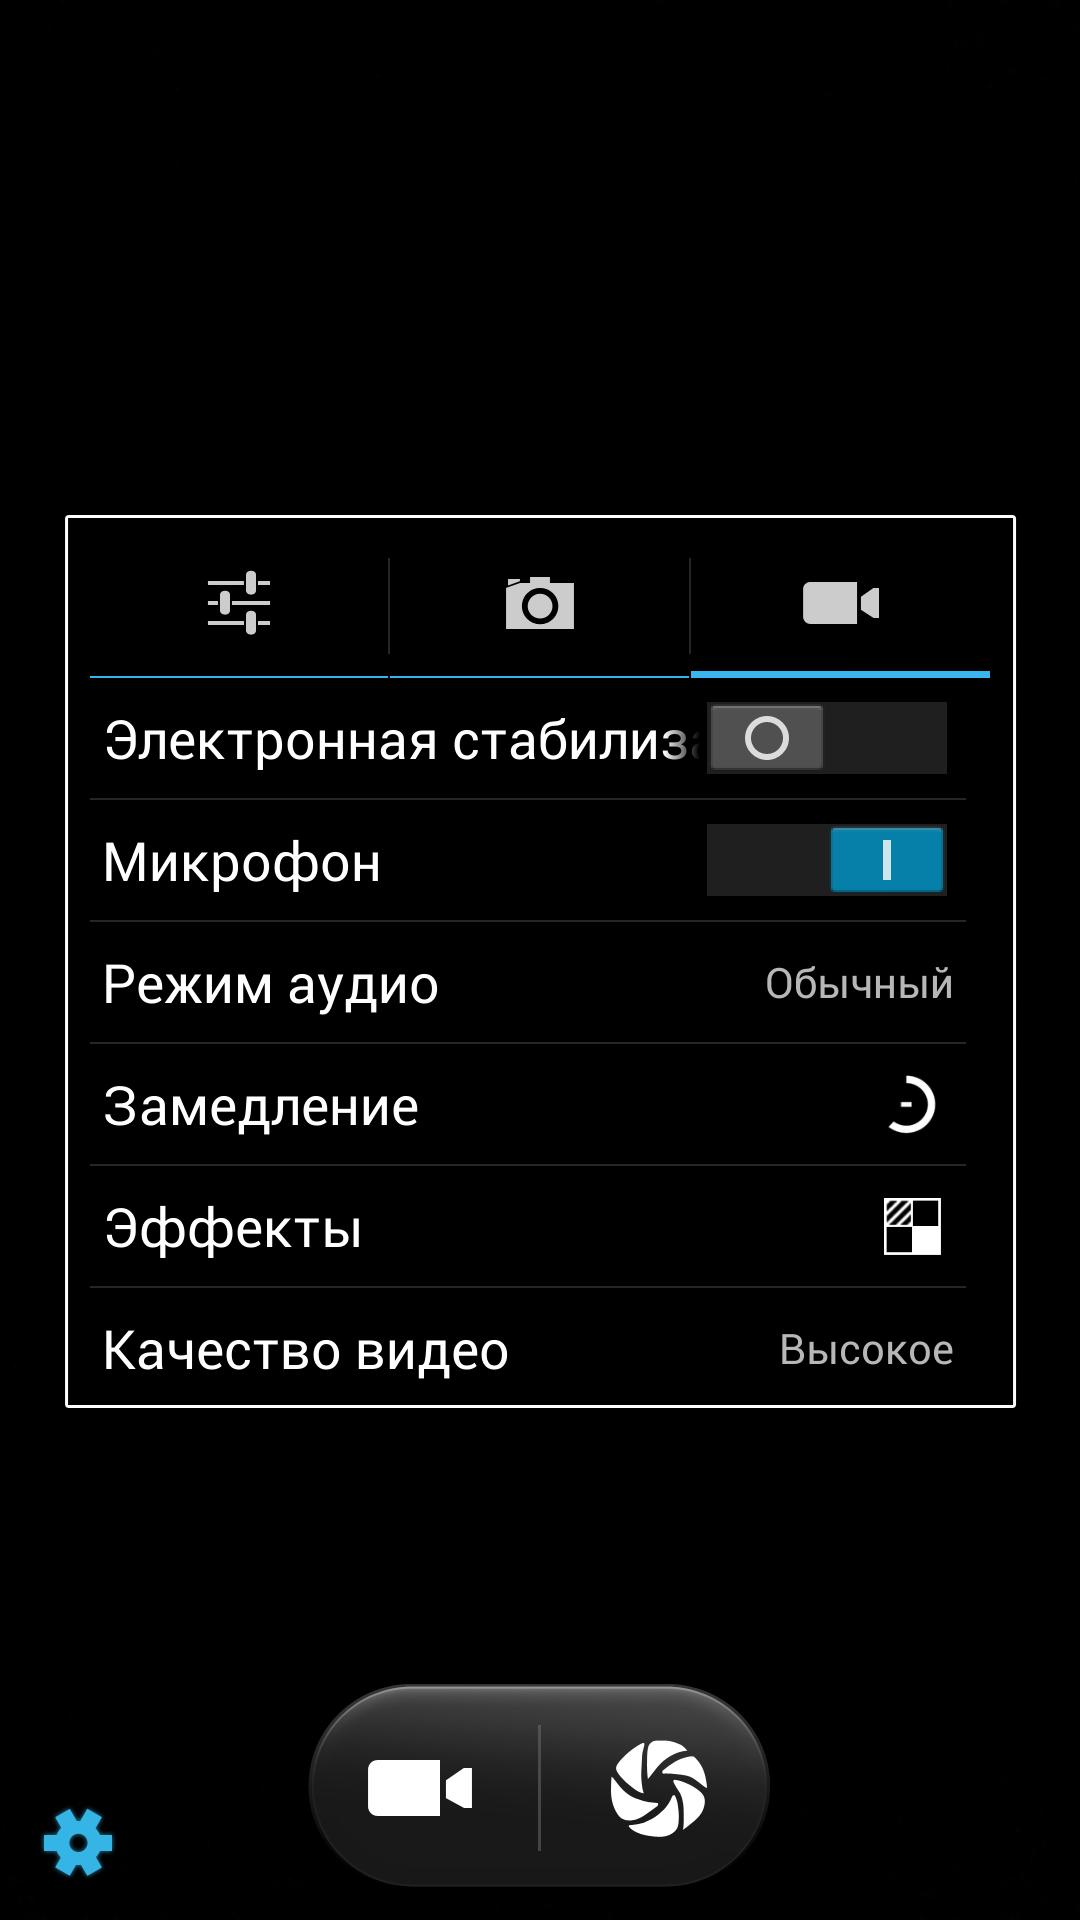 Screenshot_2014-07-11-20-00-05